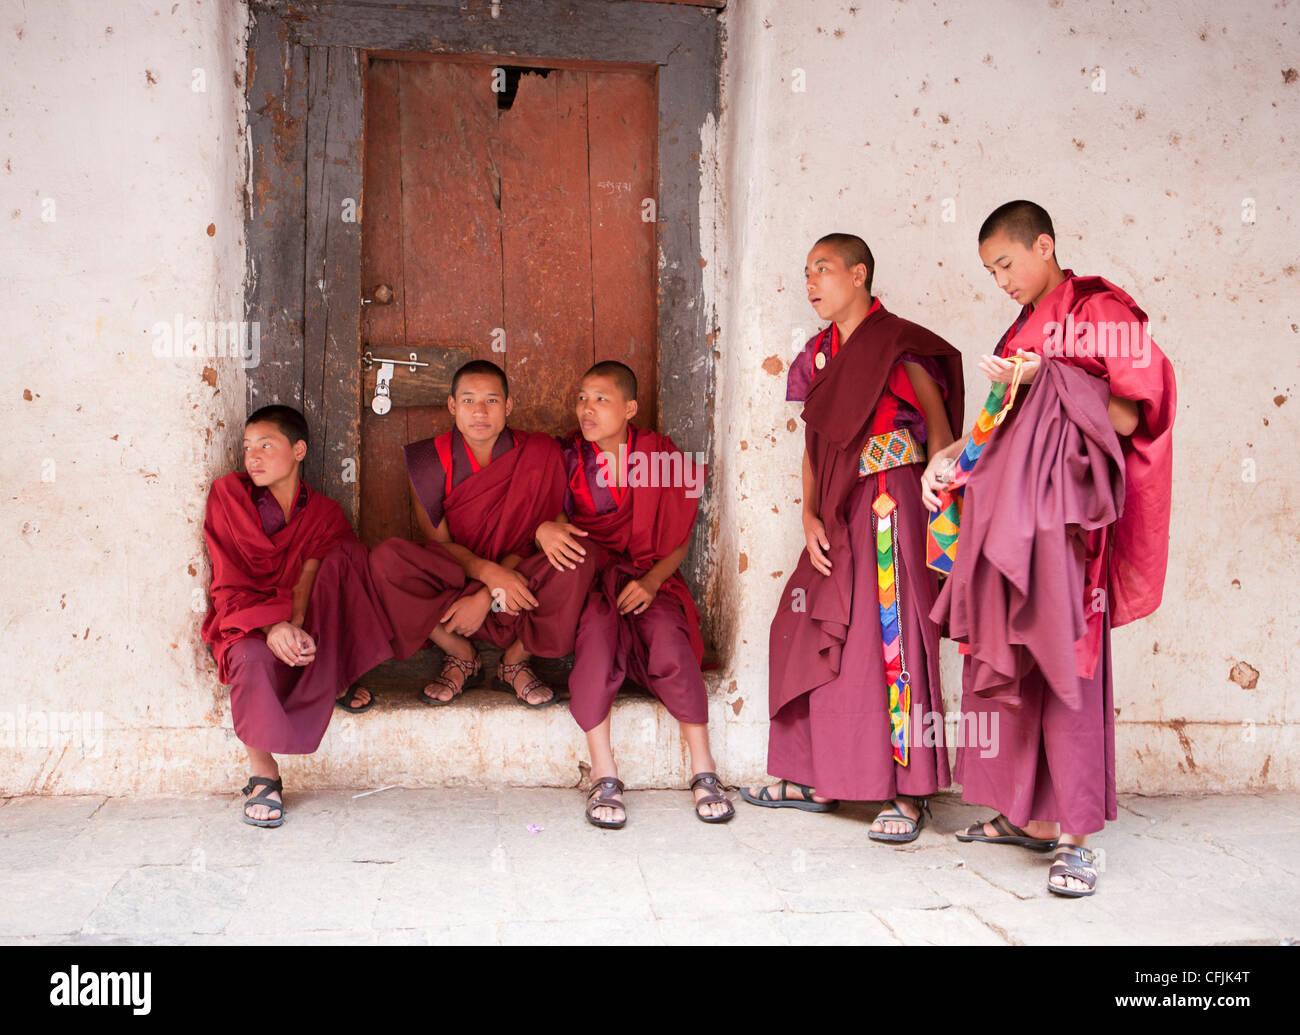 Young Buddhist monks chatting, Wangdue Phodrang Dzong, Wangdue Phodrang (Wangdi), Bhutan, Asia - Stock Image